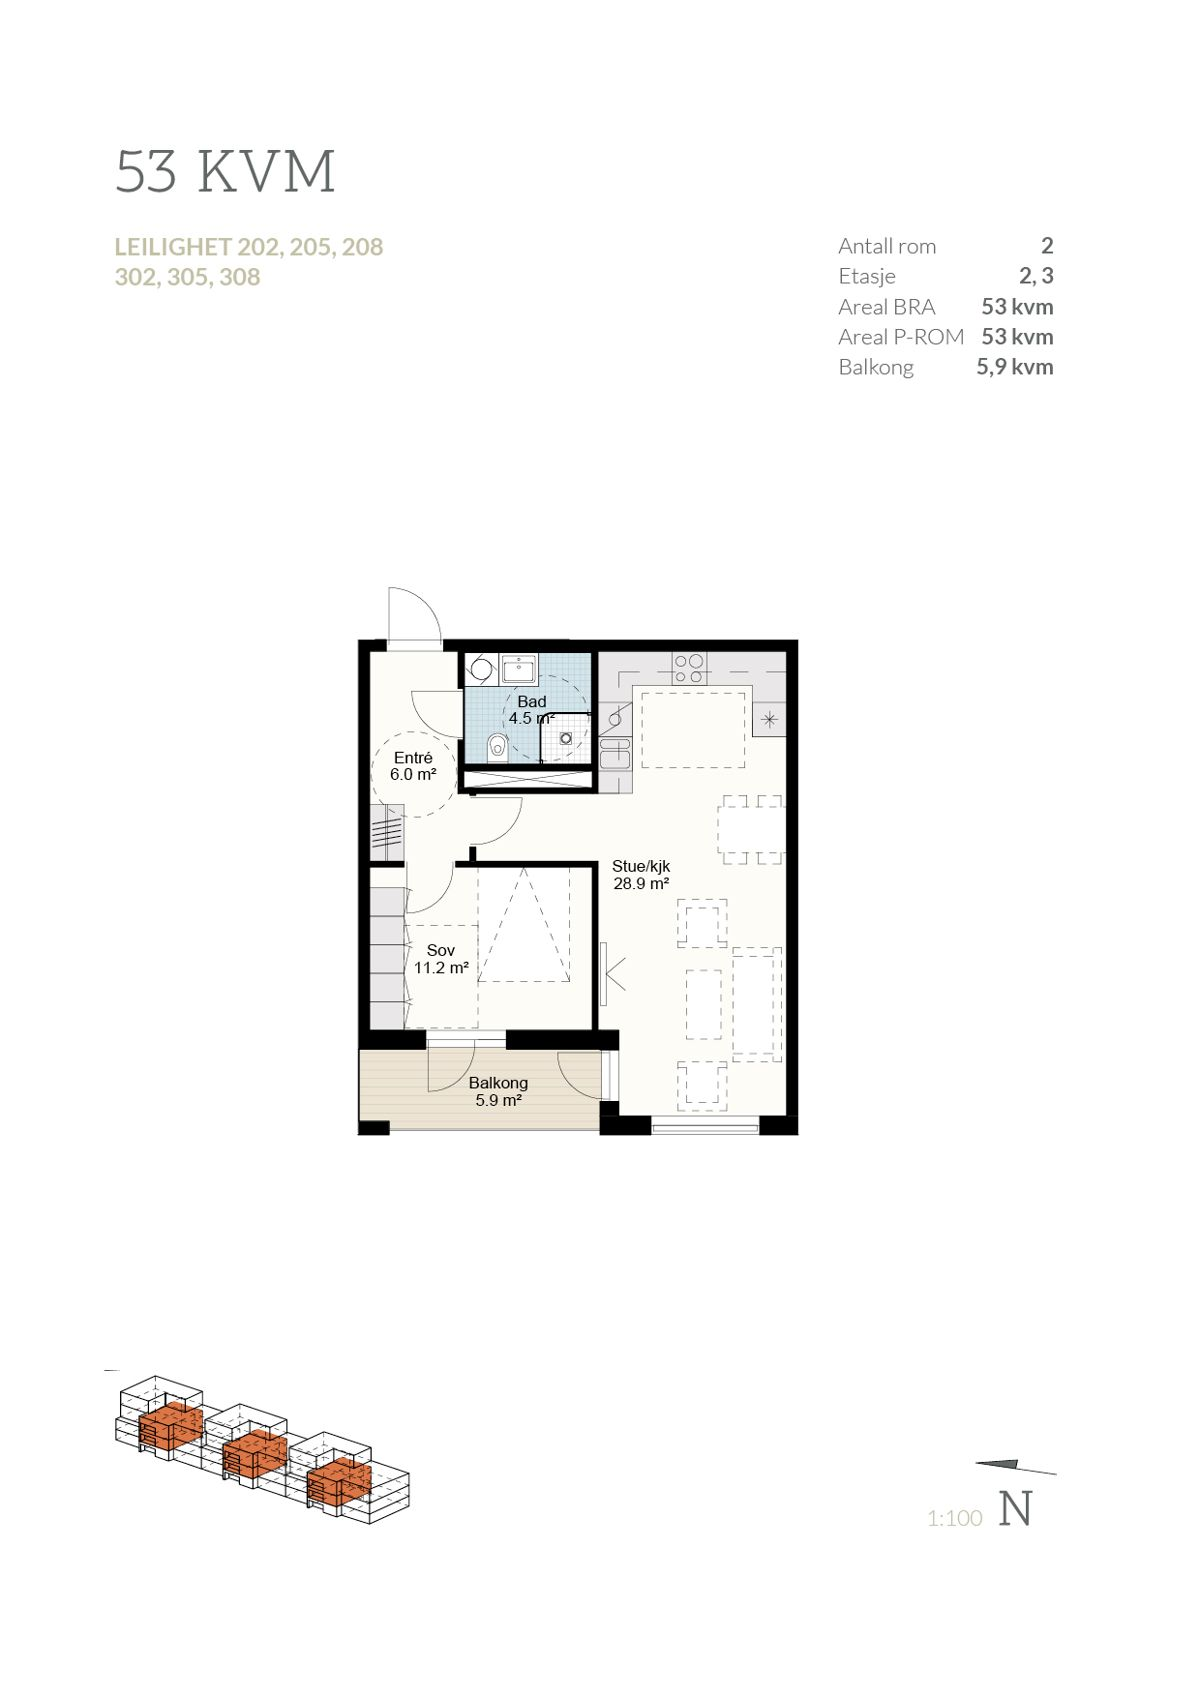 Brånåslunden Plantegning leilighet 208